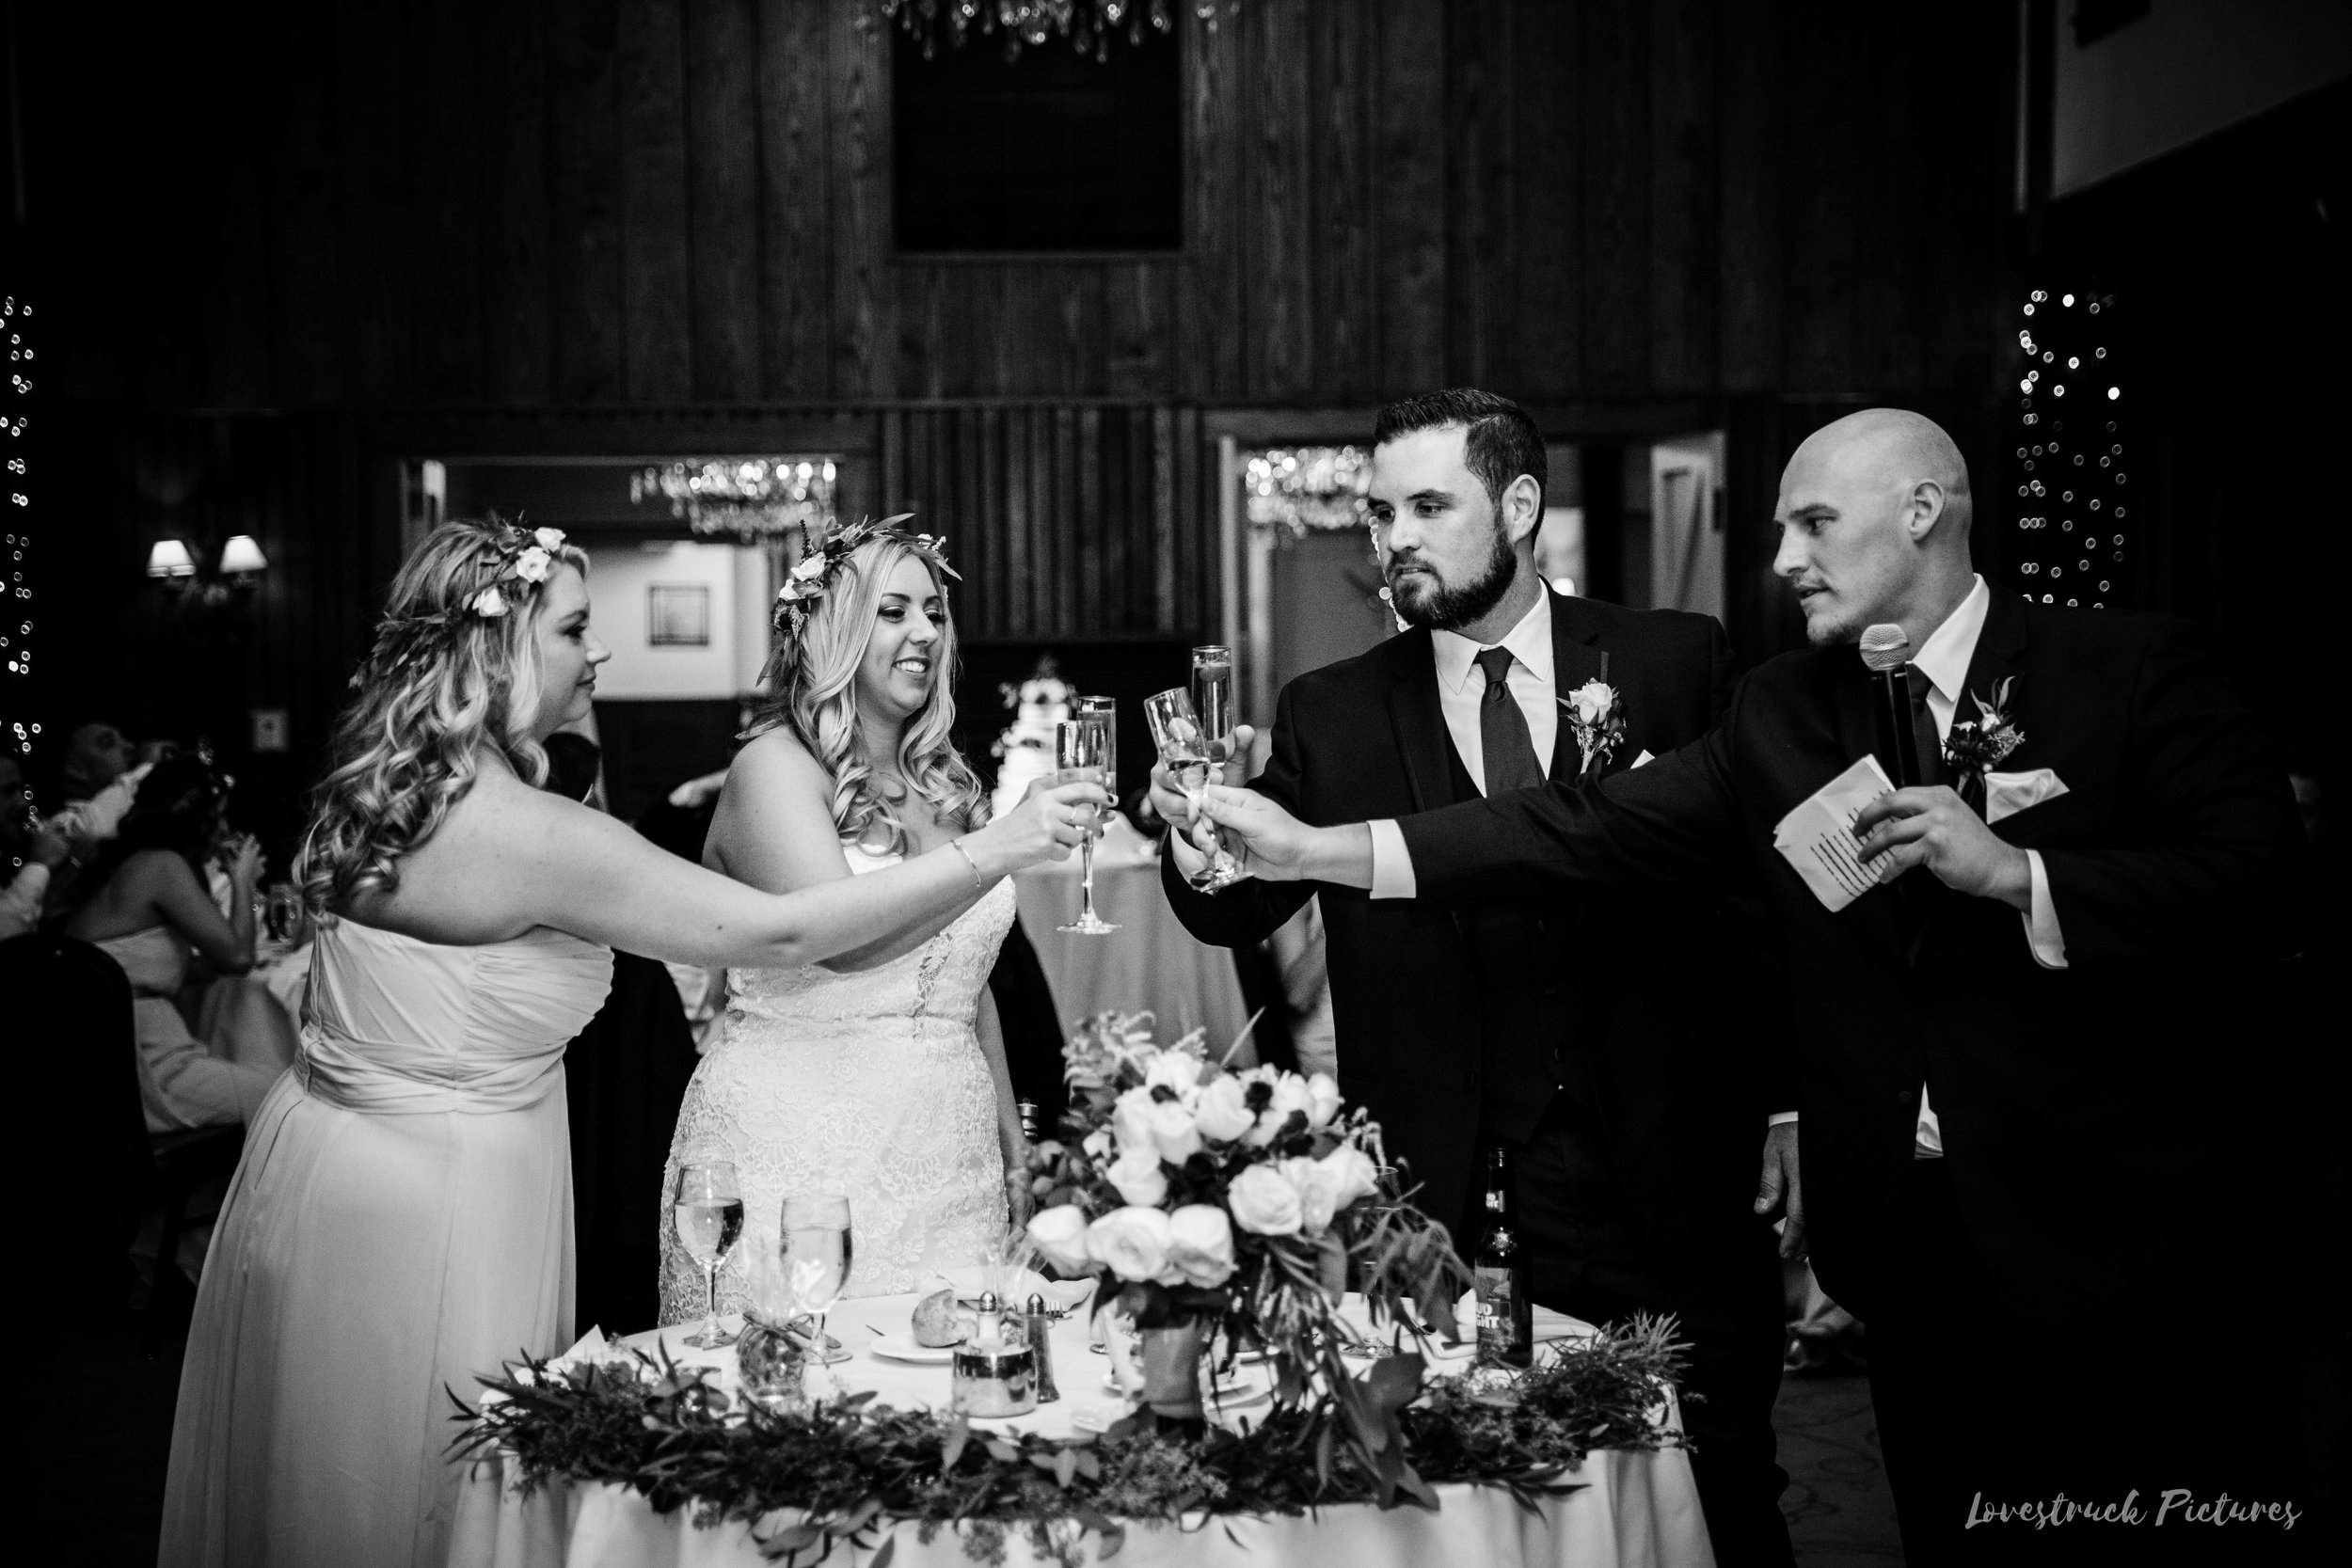 NORMANDY_FARMS_WEDDING_BLUEBELL_PA--73.jpg